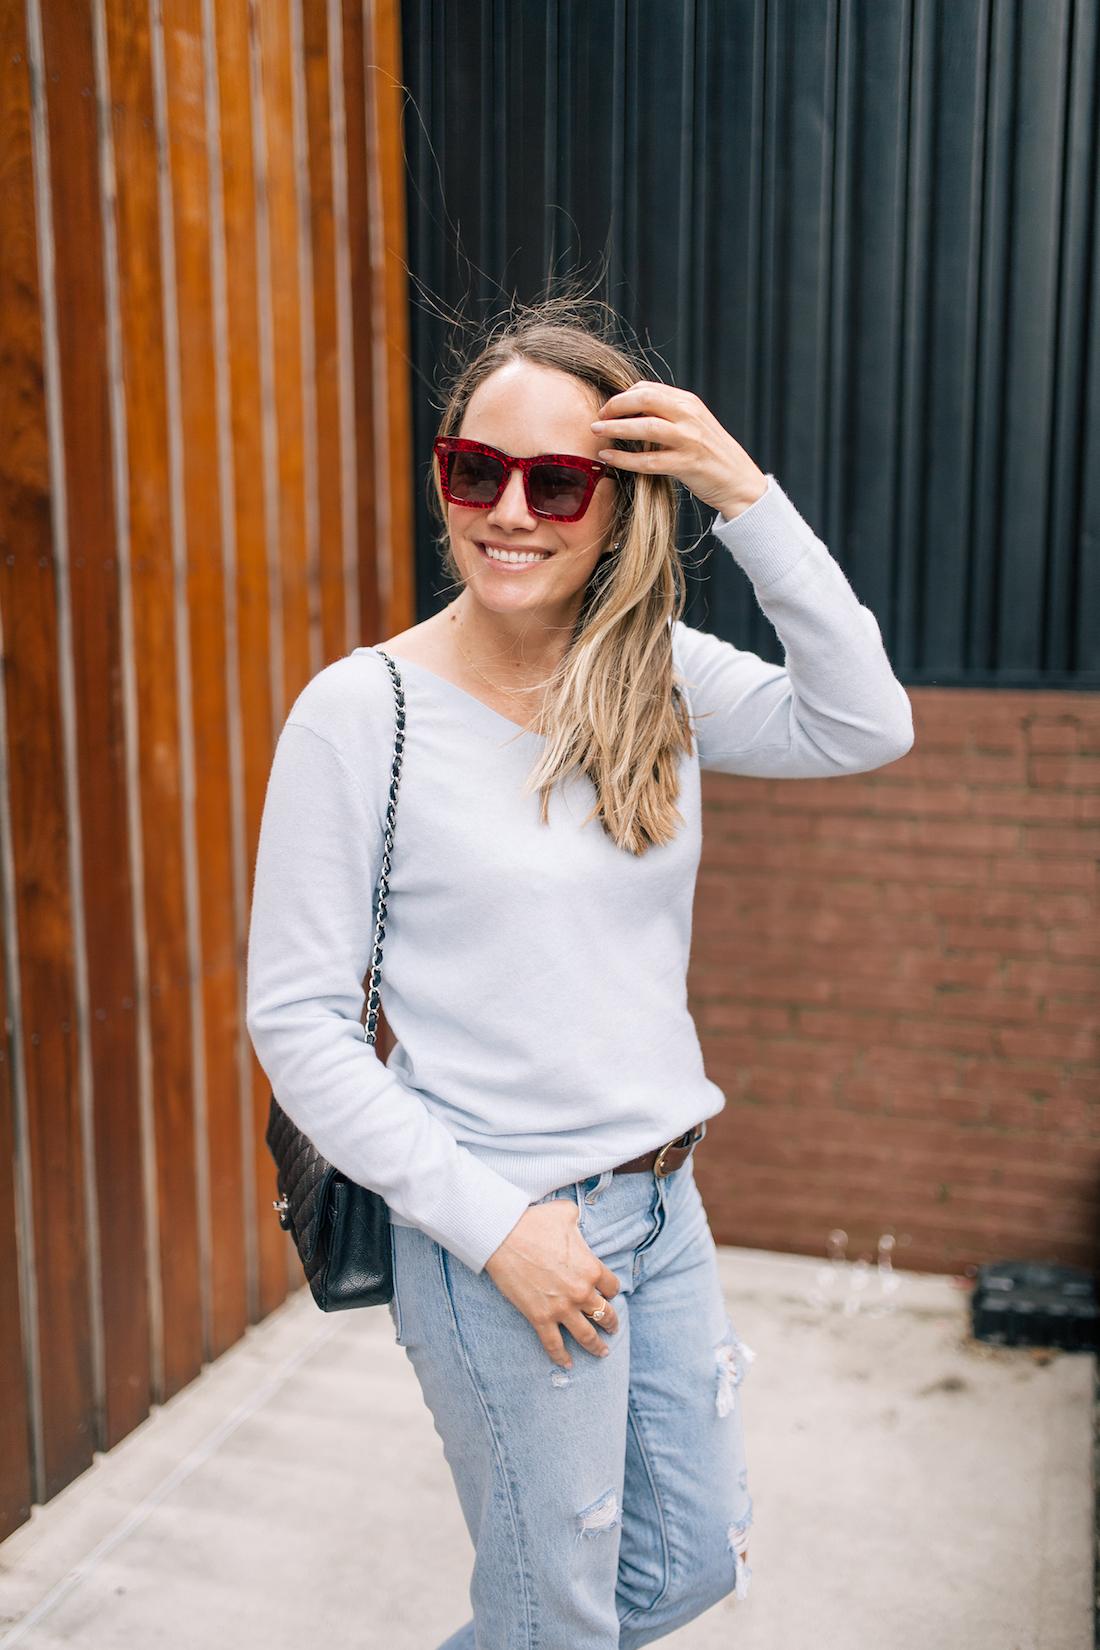 Grace Atwood's outfit details: Vince Cashmere Sweater // Levi's Jeans  // Sarah Flint Tortoise Slingbacks // Old J.Crew Belt // Chanel Purse // Karen Walker Sunglasses